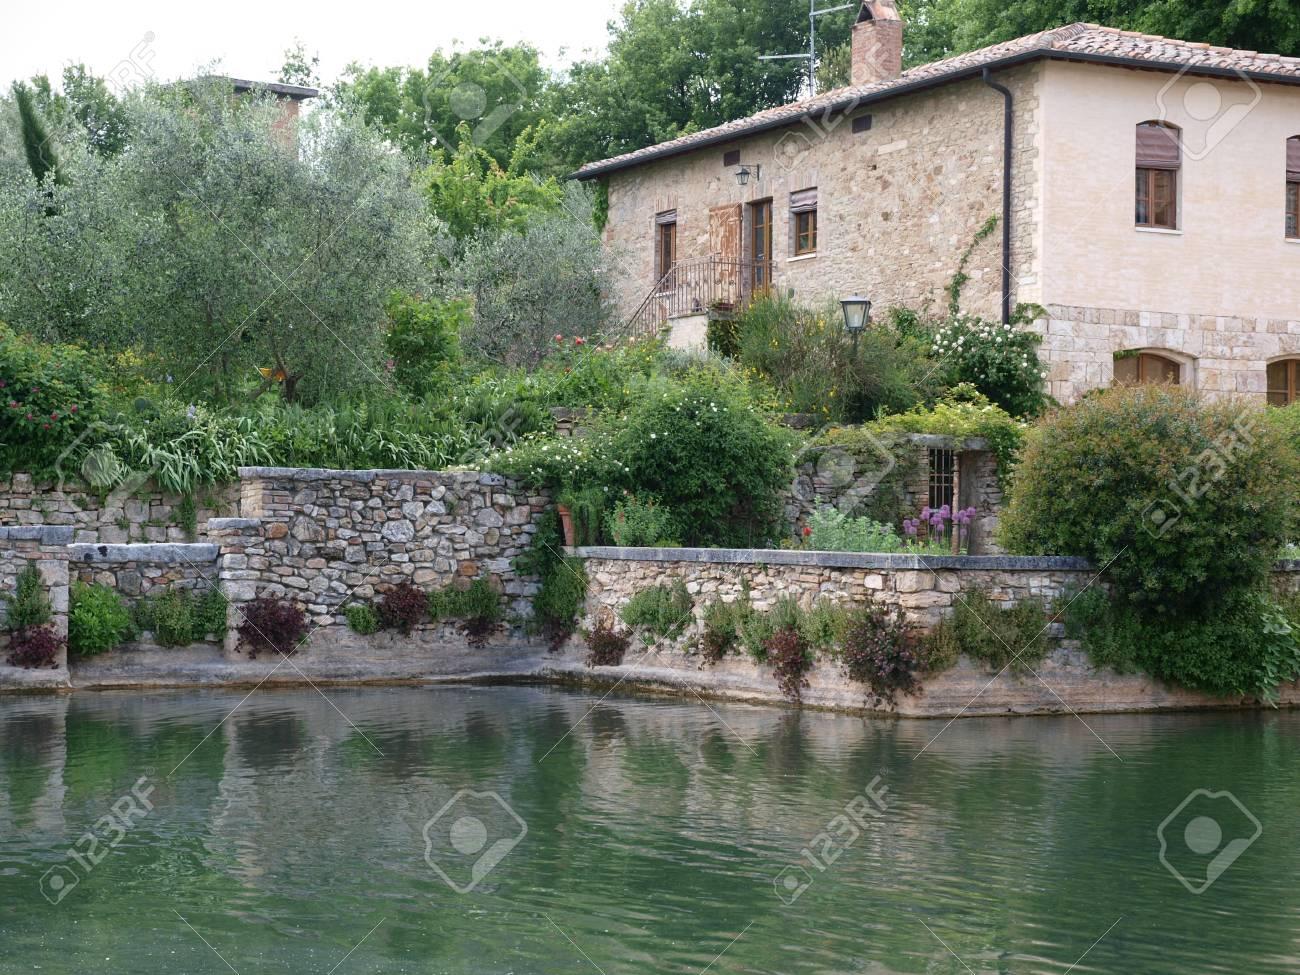 https://previews.123rf.com/images/wjarek/wjarek1202/wjarek120200105/12345031-bagno-vignoni-in-tuscany-spa-known-for-the-middle-ages.jpg